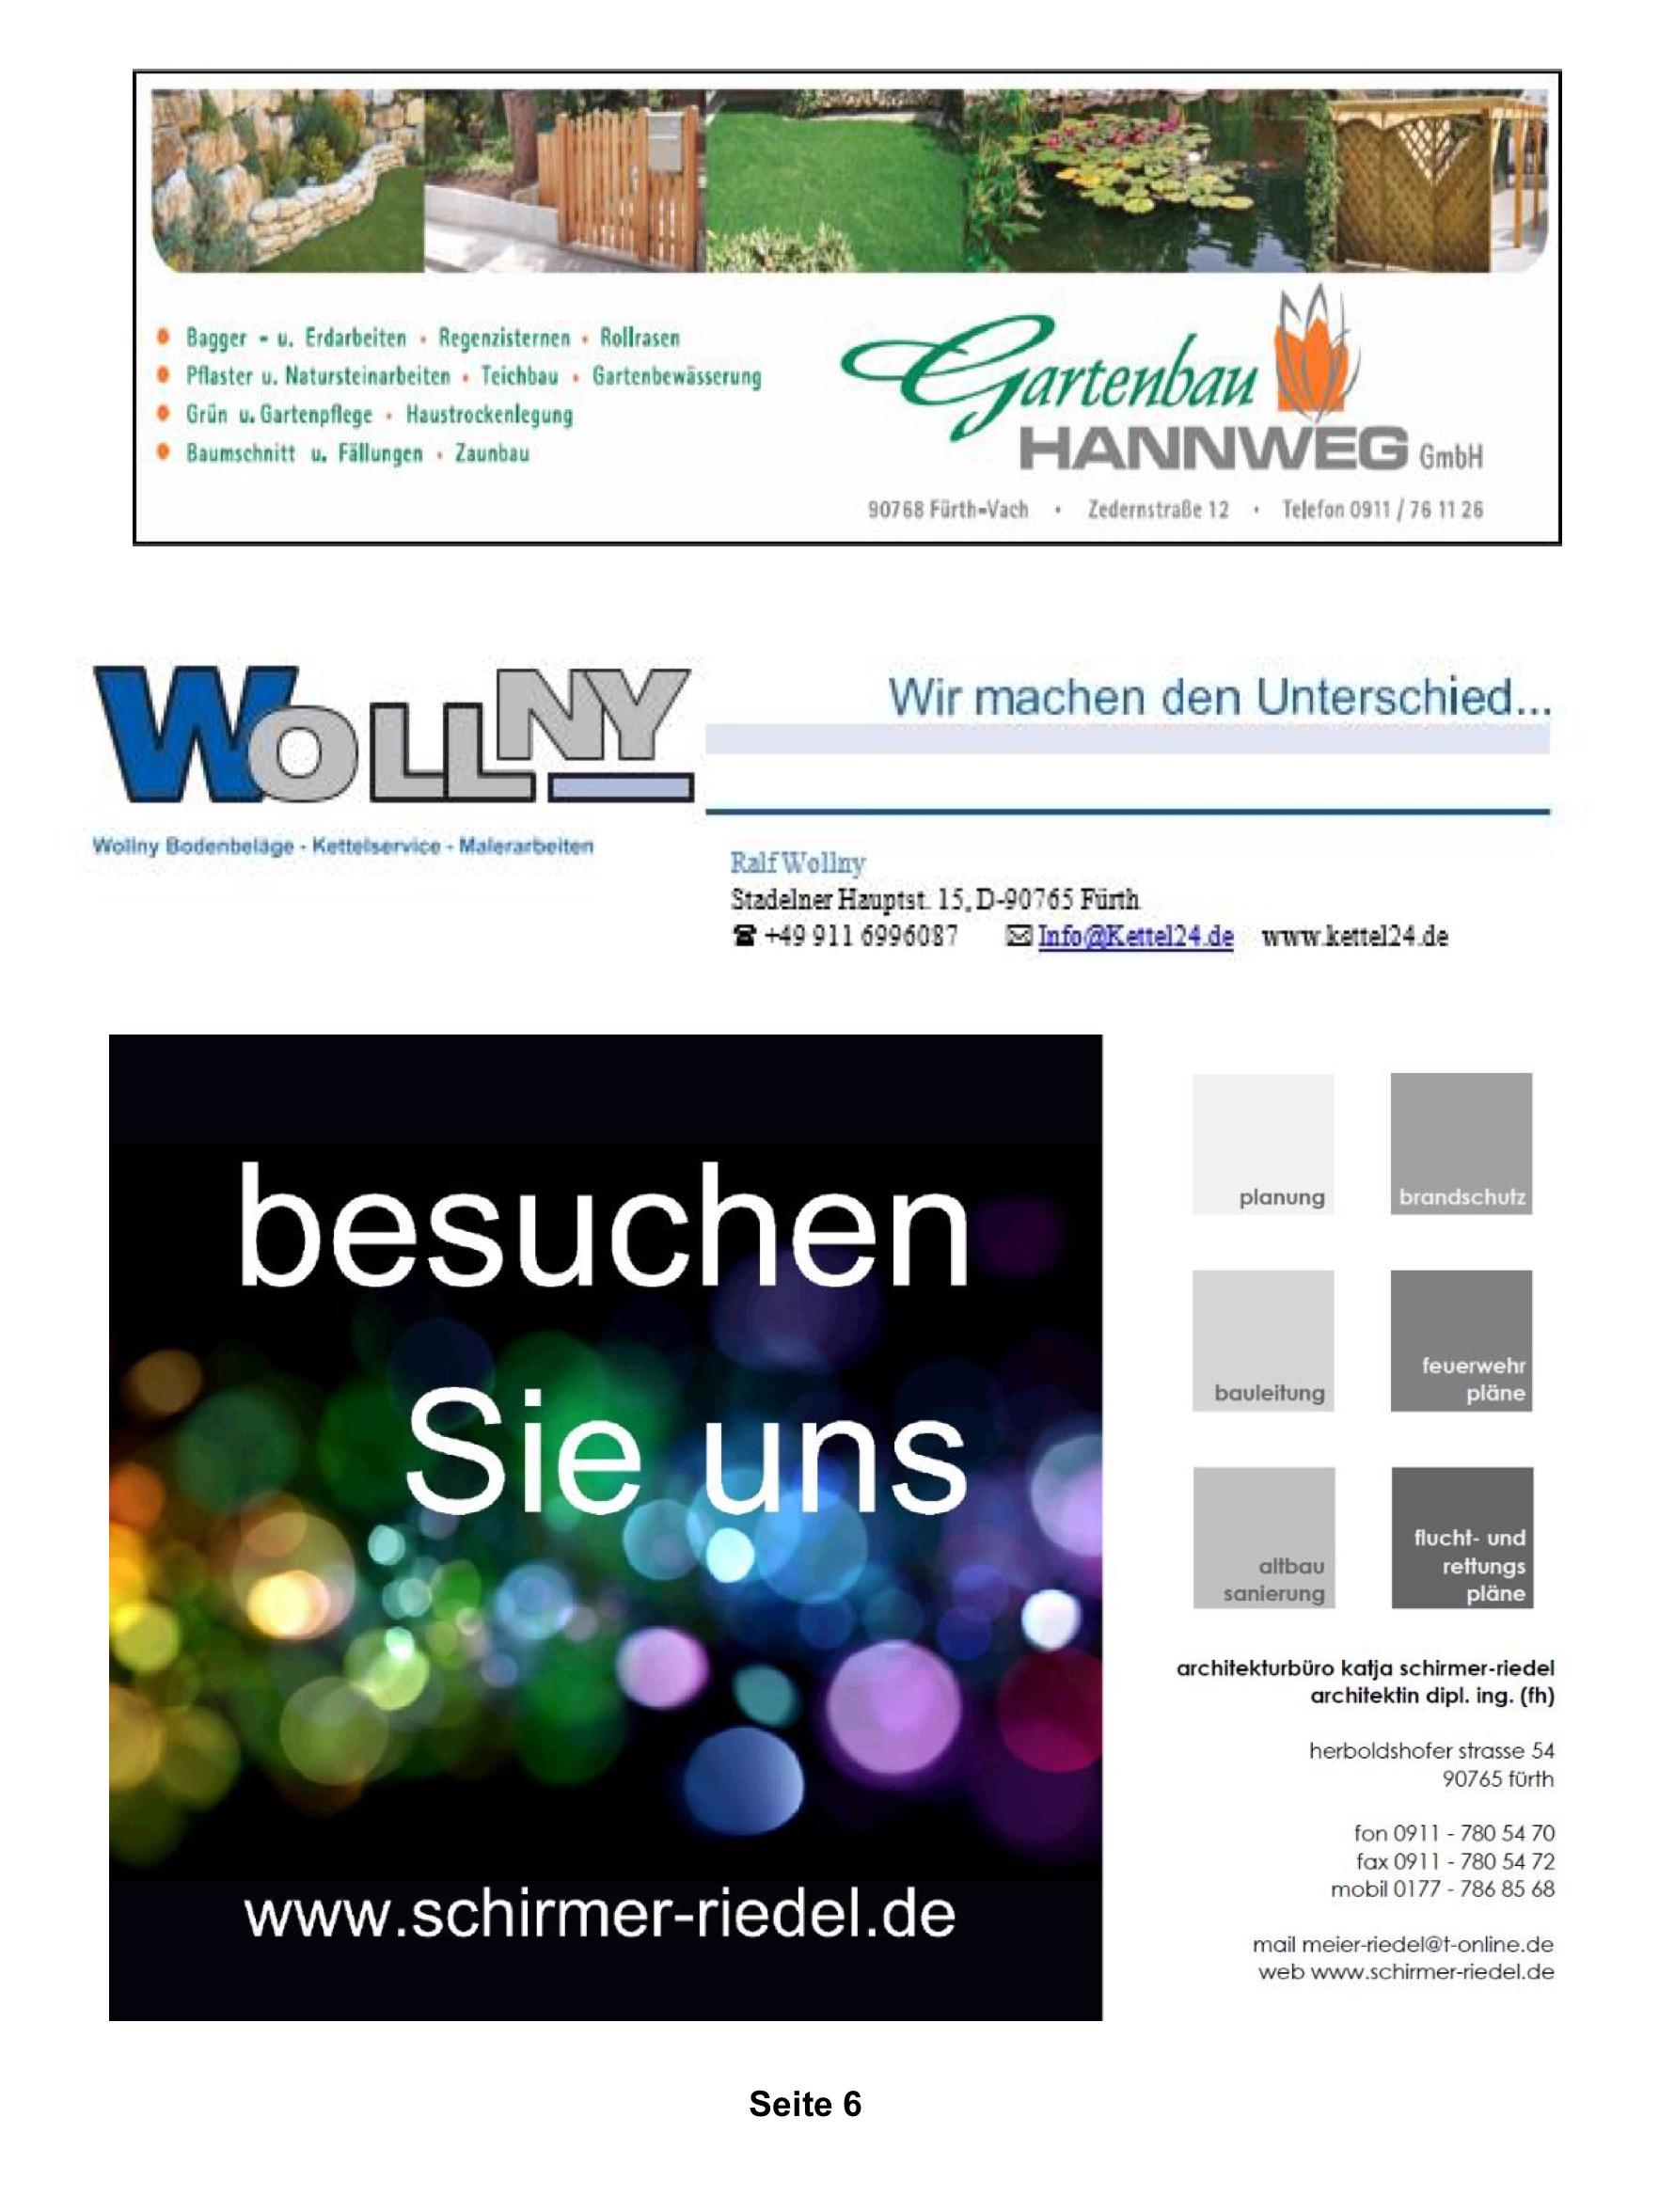 06Kalchreuth-6.jpeg